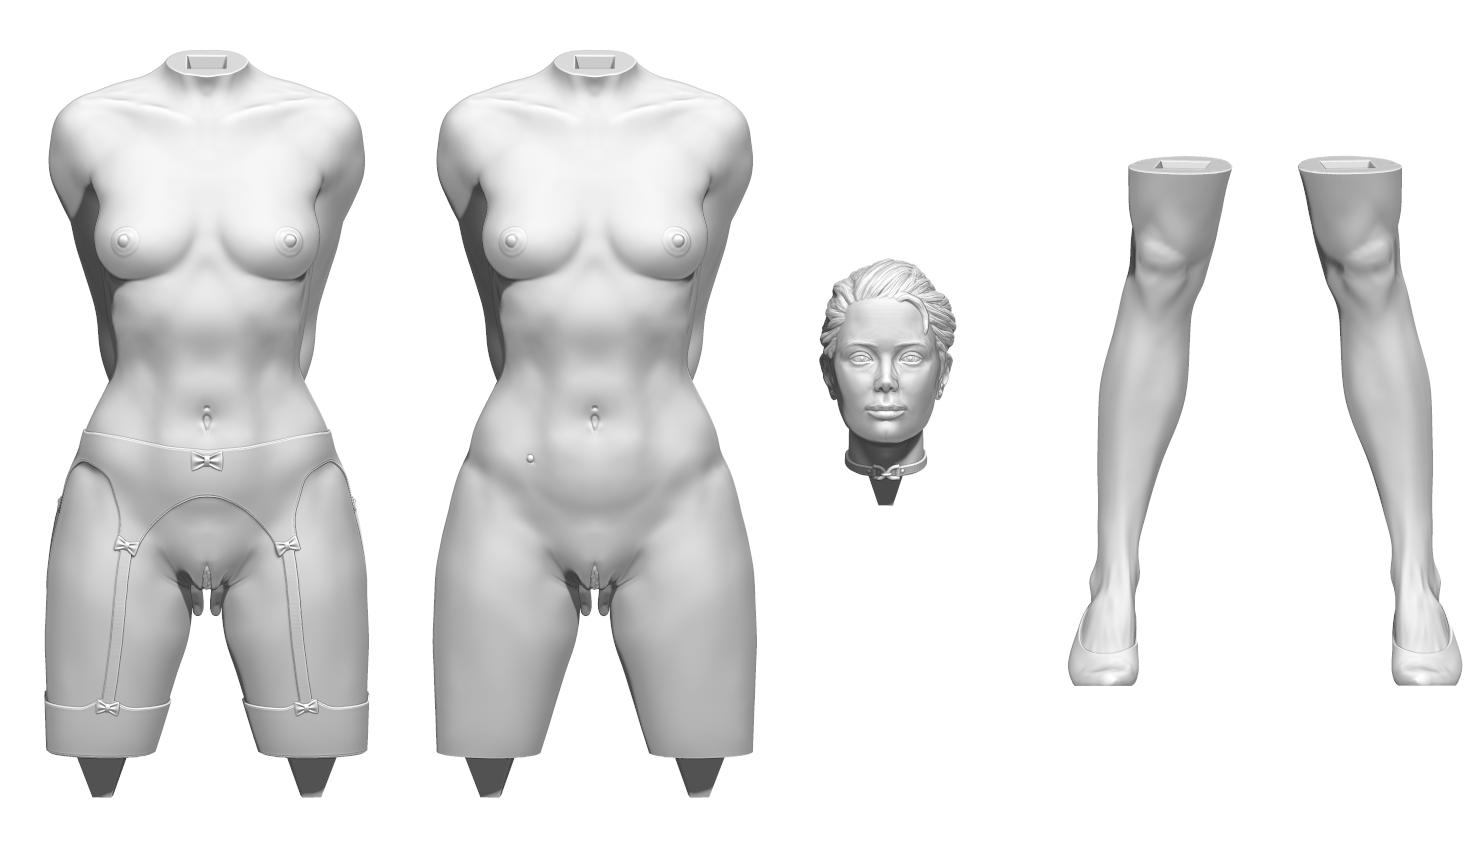 aaaaa.png Télécharger fichier STL Little Caprice Pose 2 • Objet imprimable en 3D, BODY3D